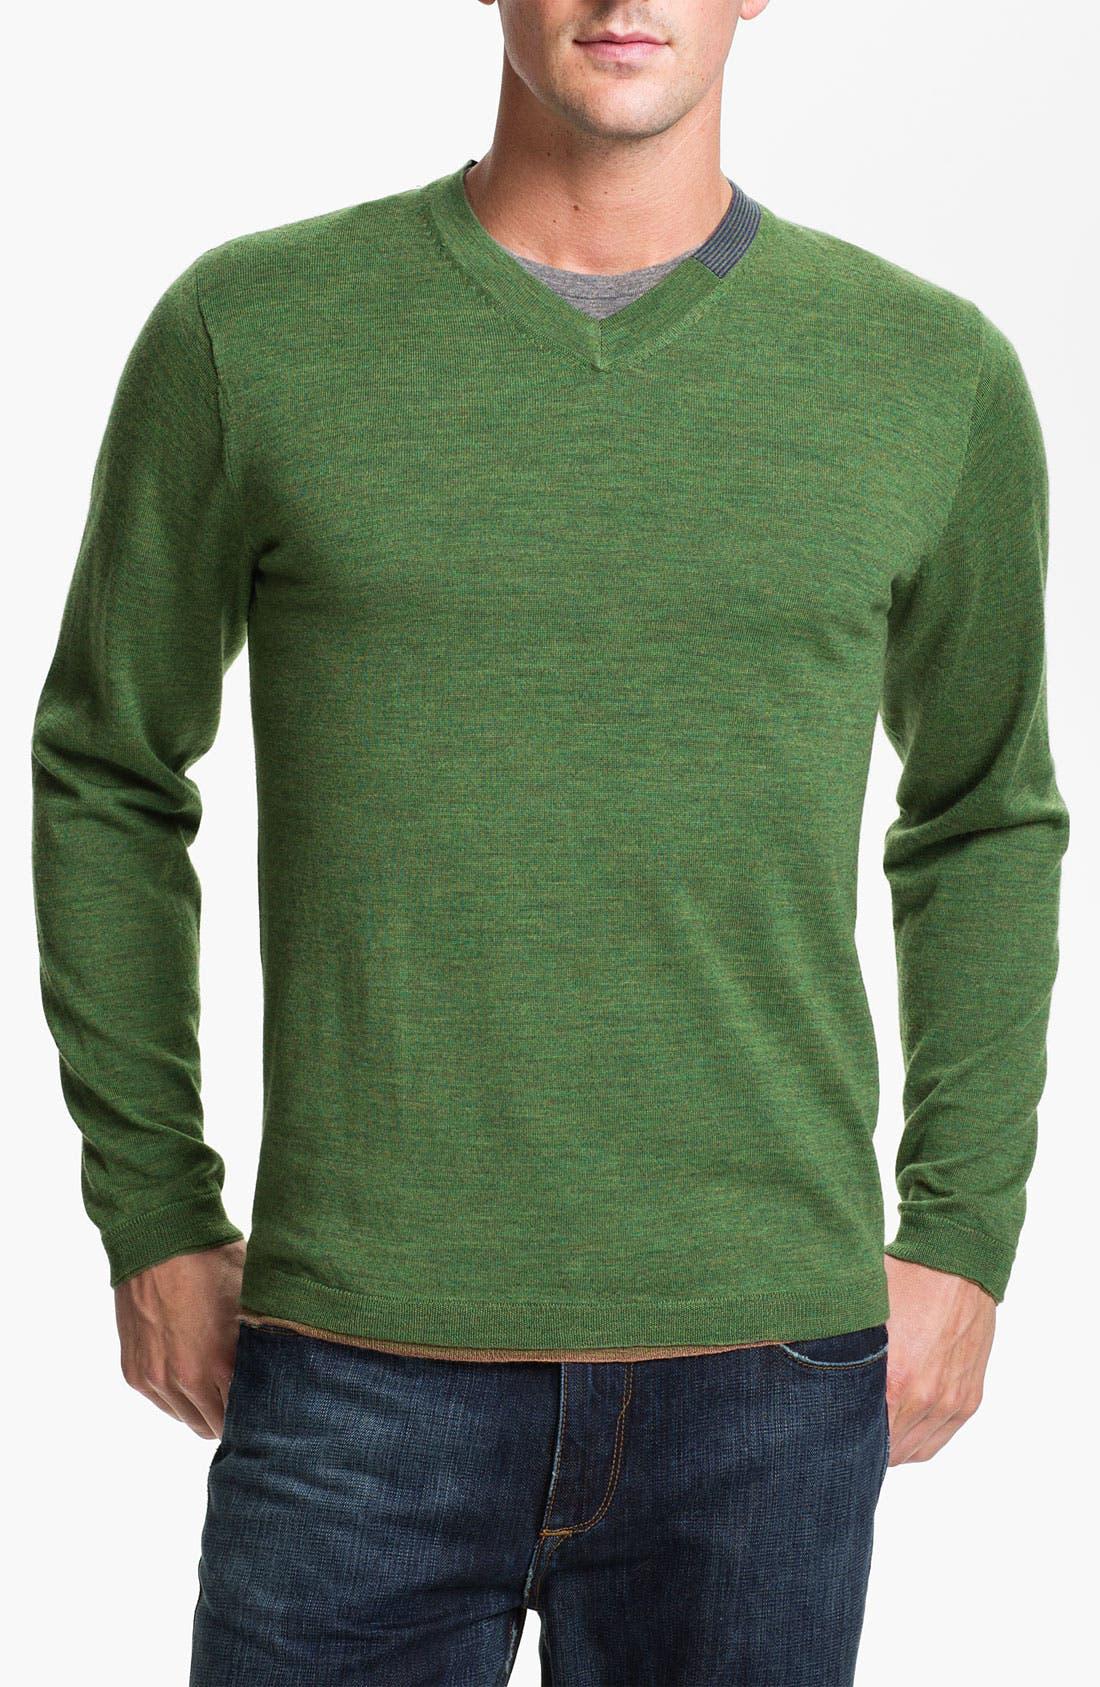 Main Image - Robert Graham 'Forest' V-Neck Wool Sweater